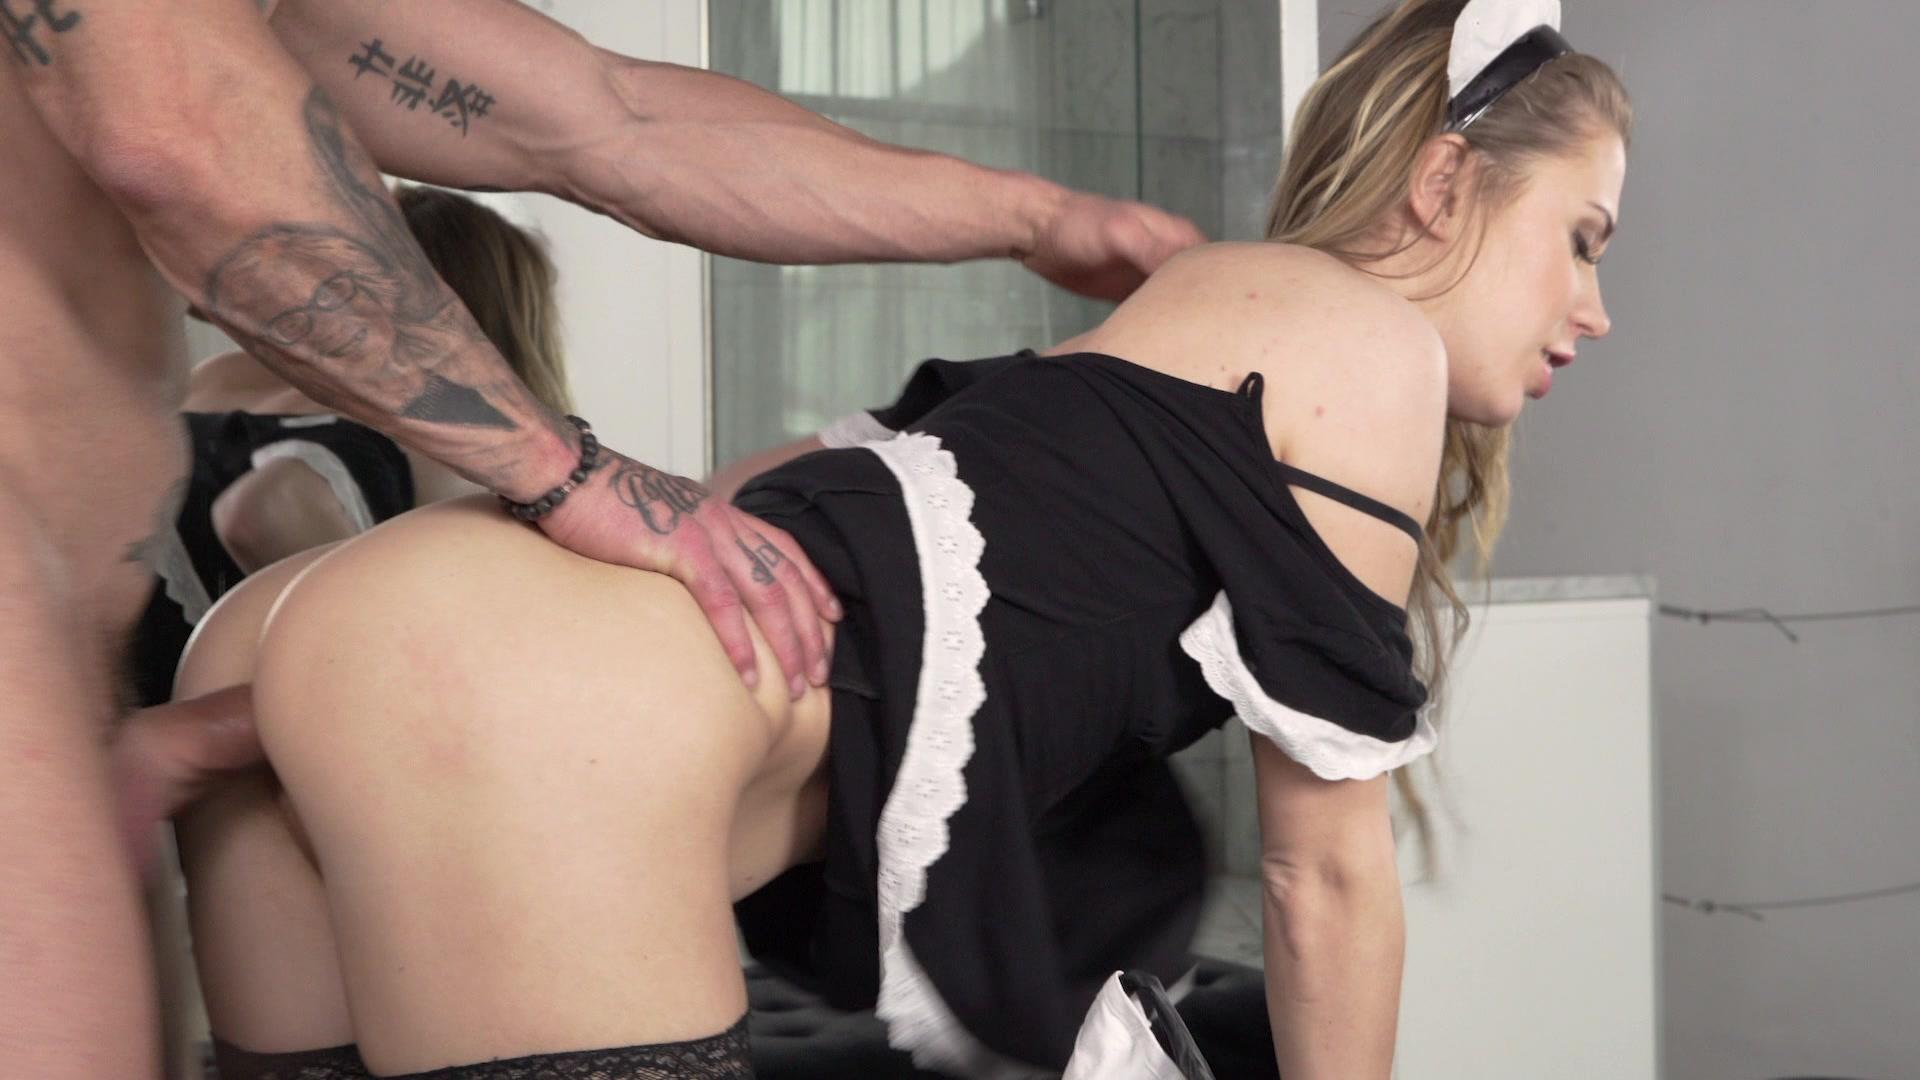 Naughty maids room sex service dvd